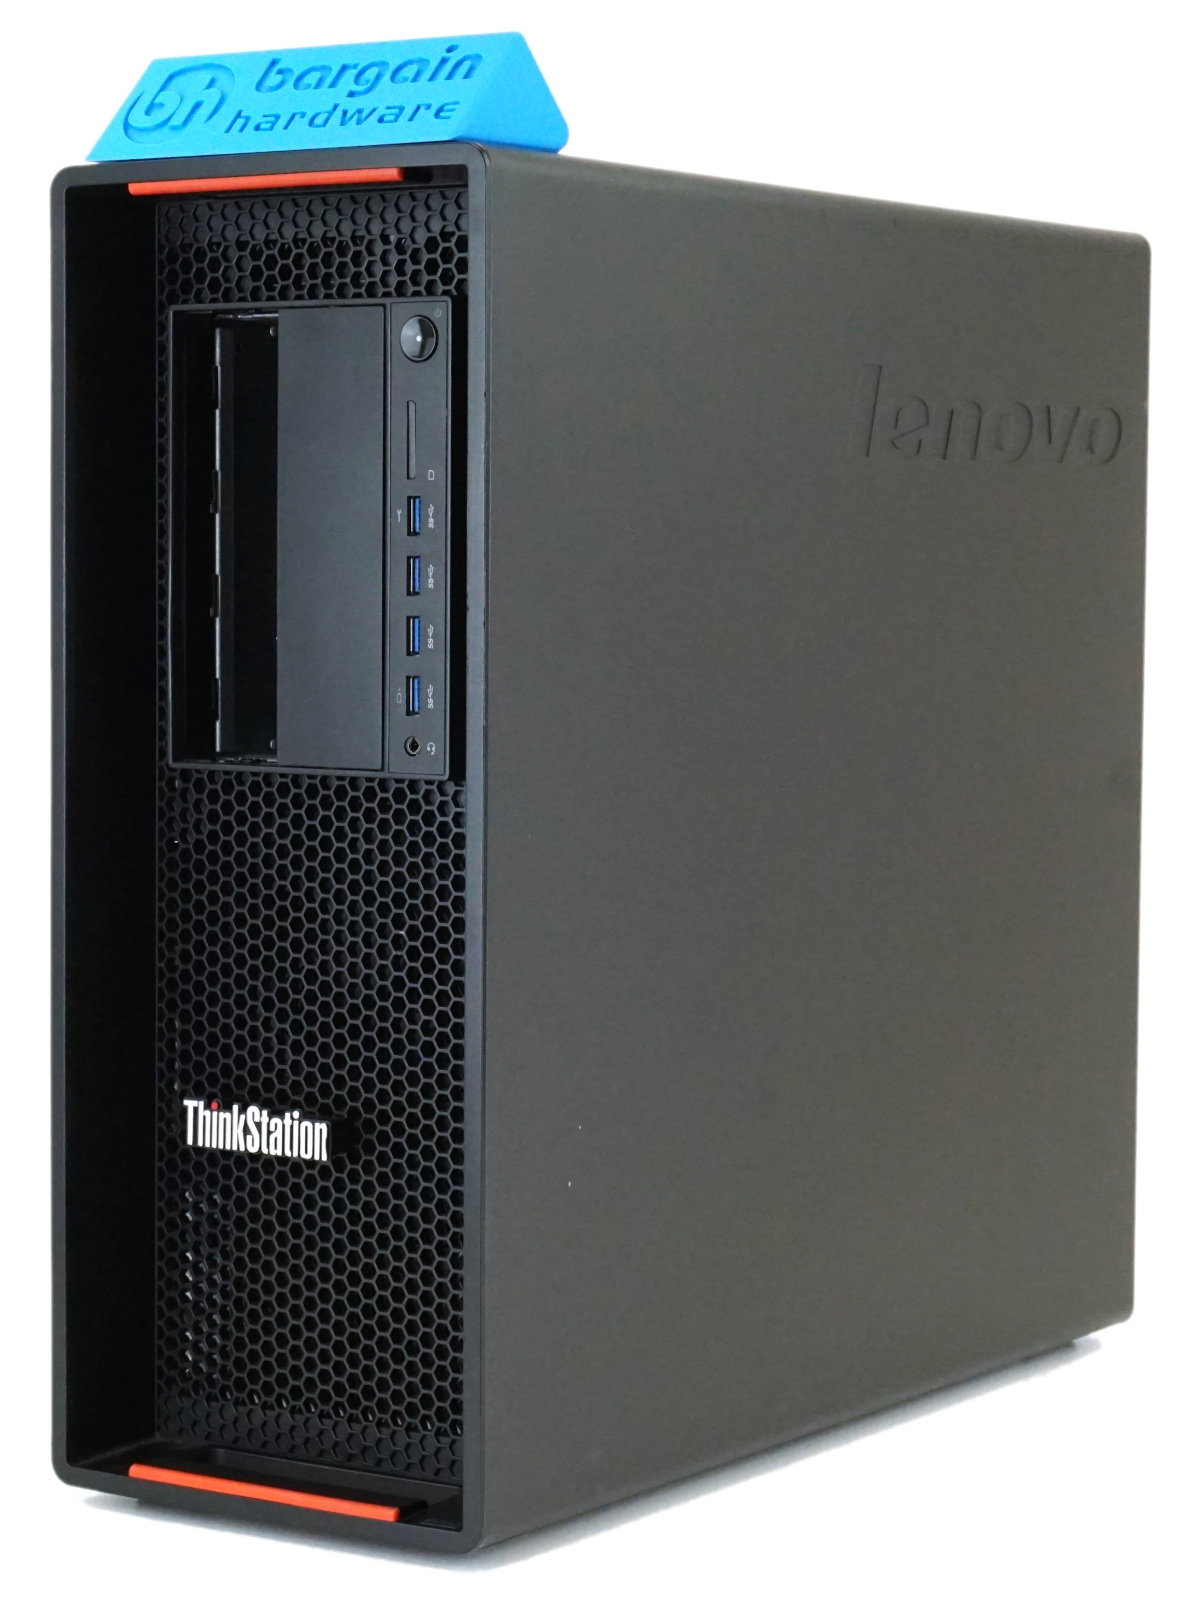 PARTS-QUICK Brand 16GB Memory for Lenovo ThinkStation P900 Workstation DDR4 PC4-17000 2133 MHz RDIMM RAM